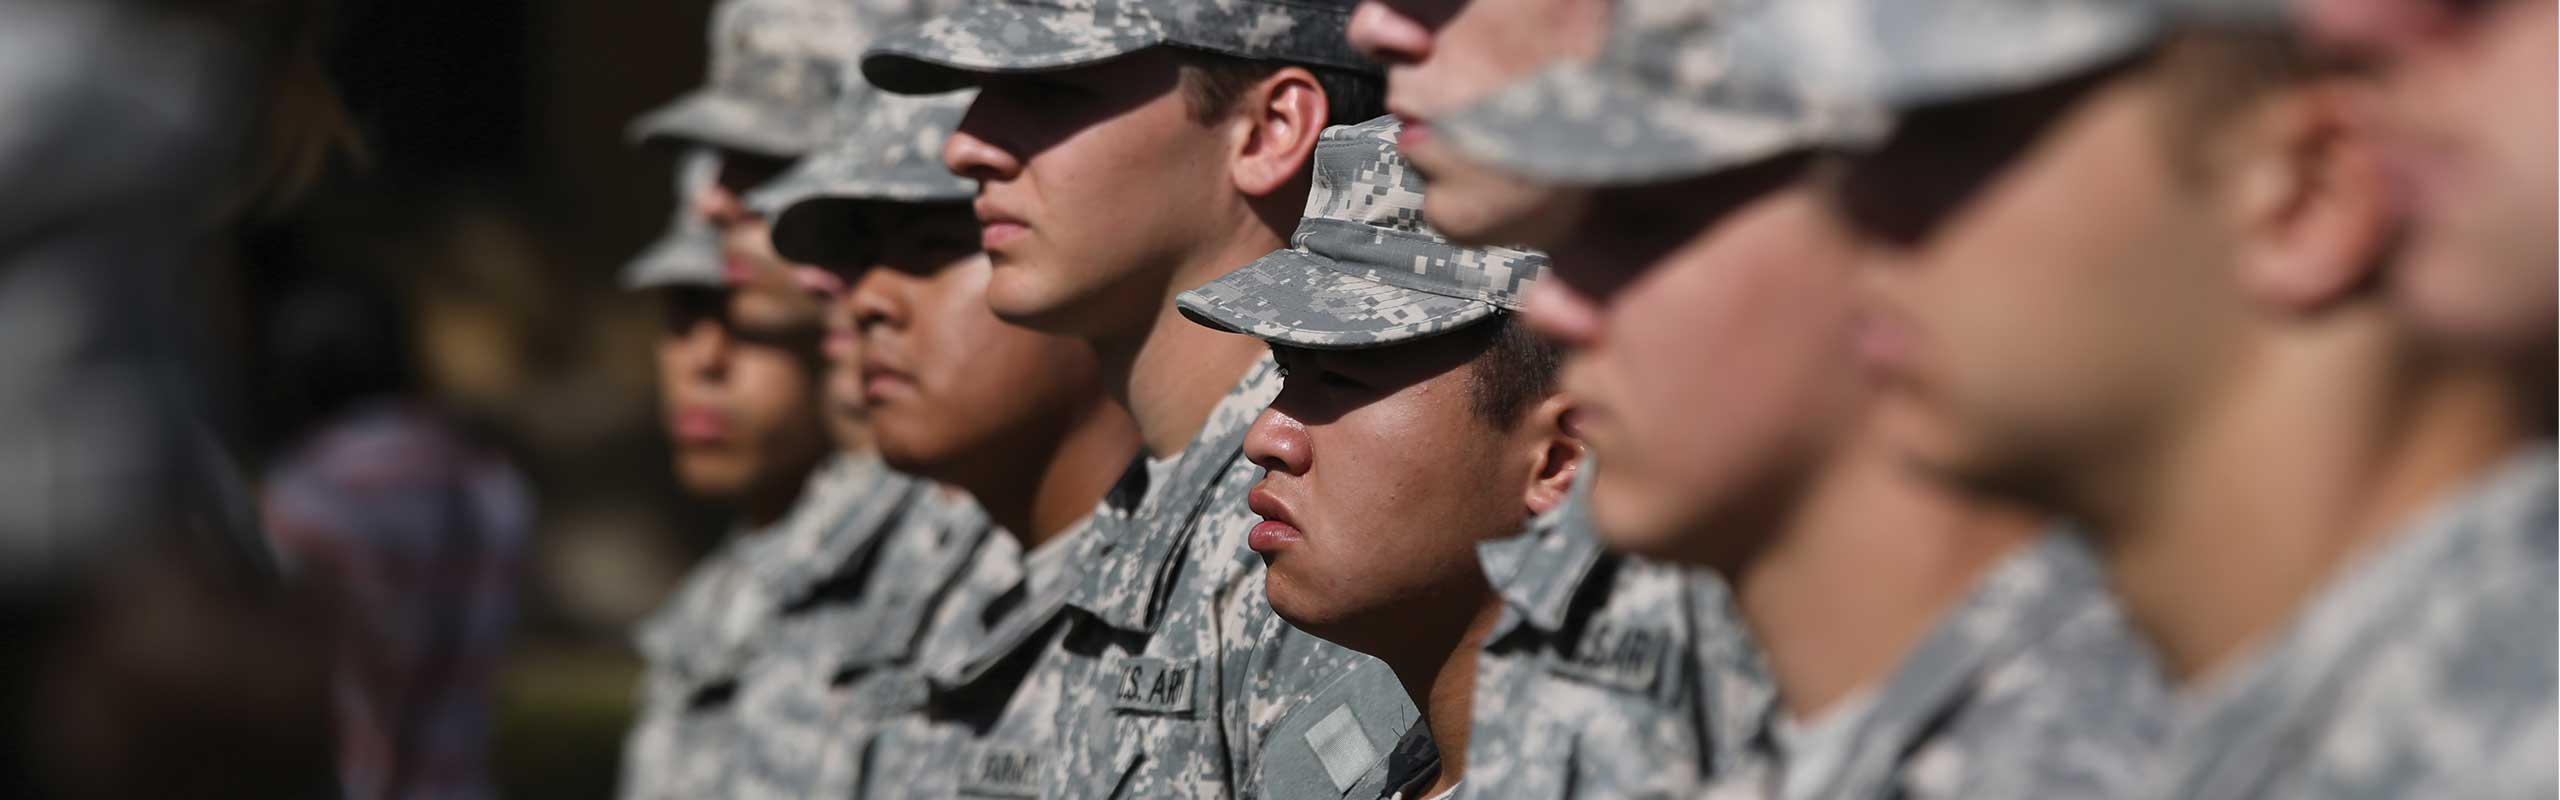 Army-Baylor